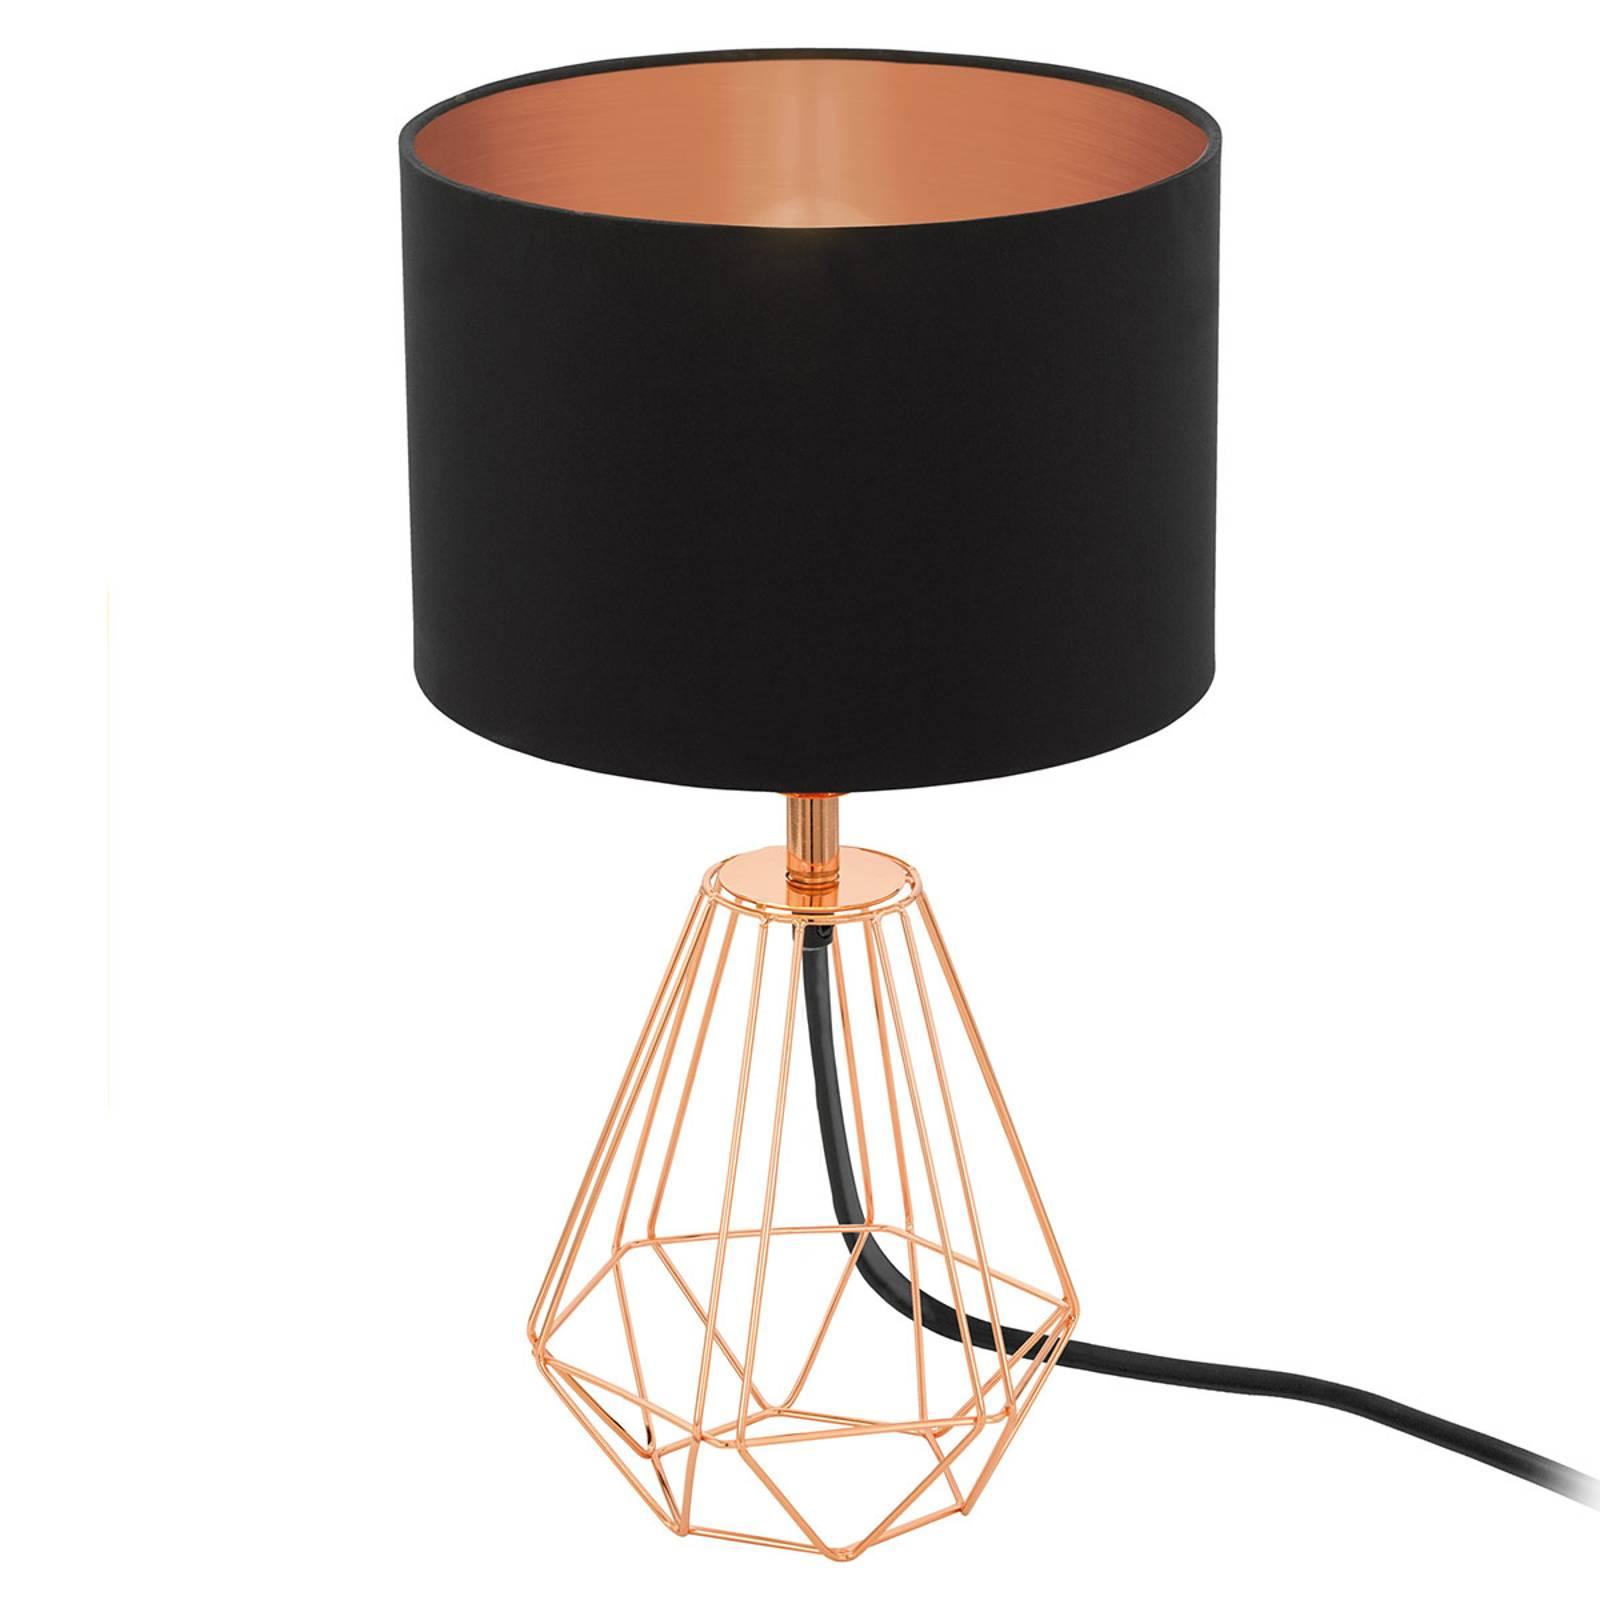 Tafellamp Carlton 2 zwart-koper